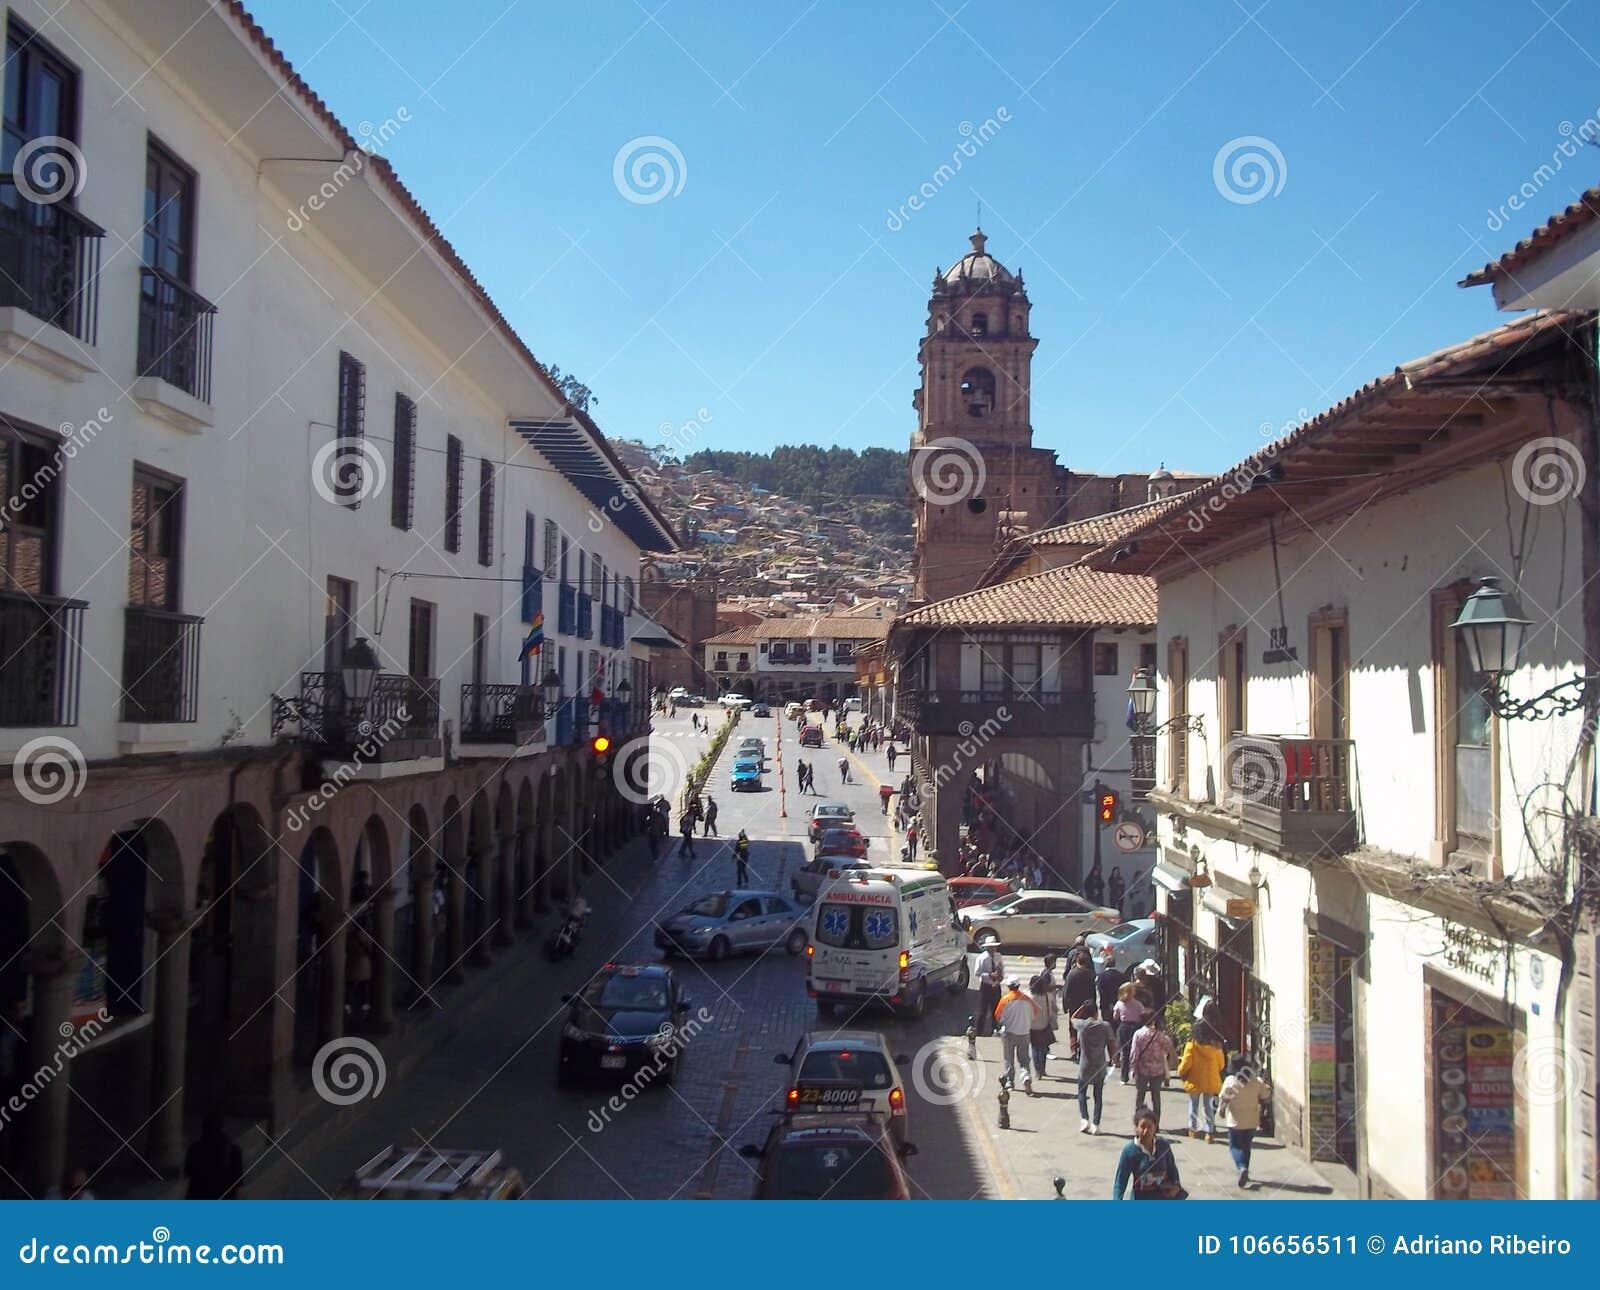 Historic city of Cuzco